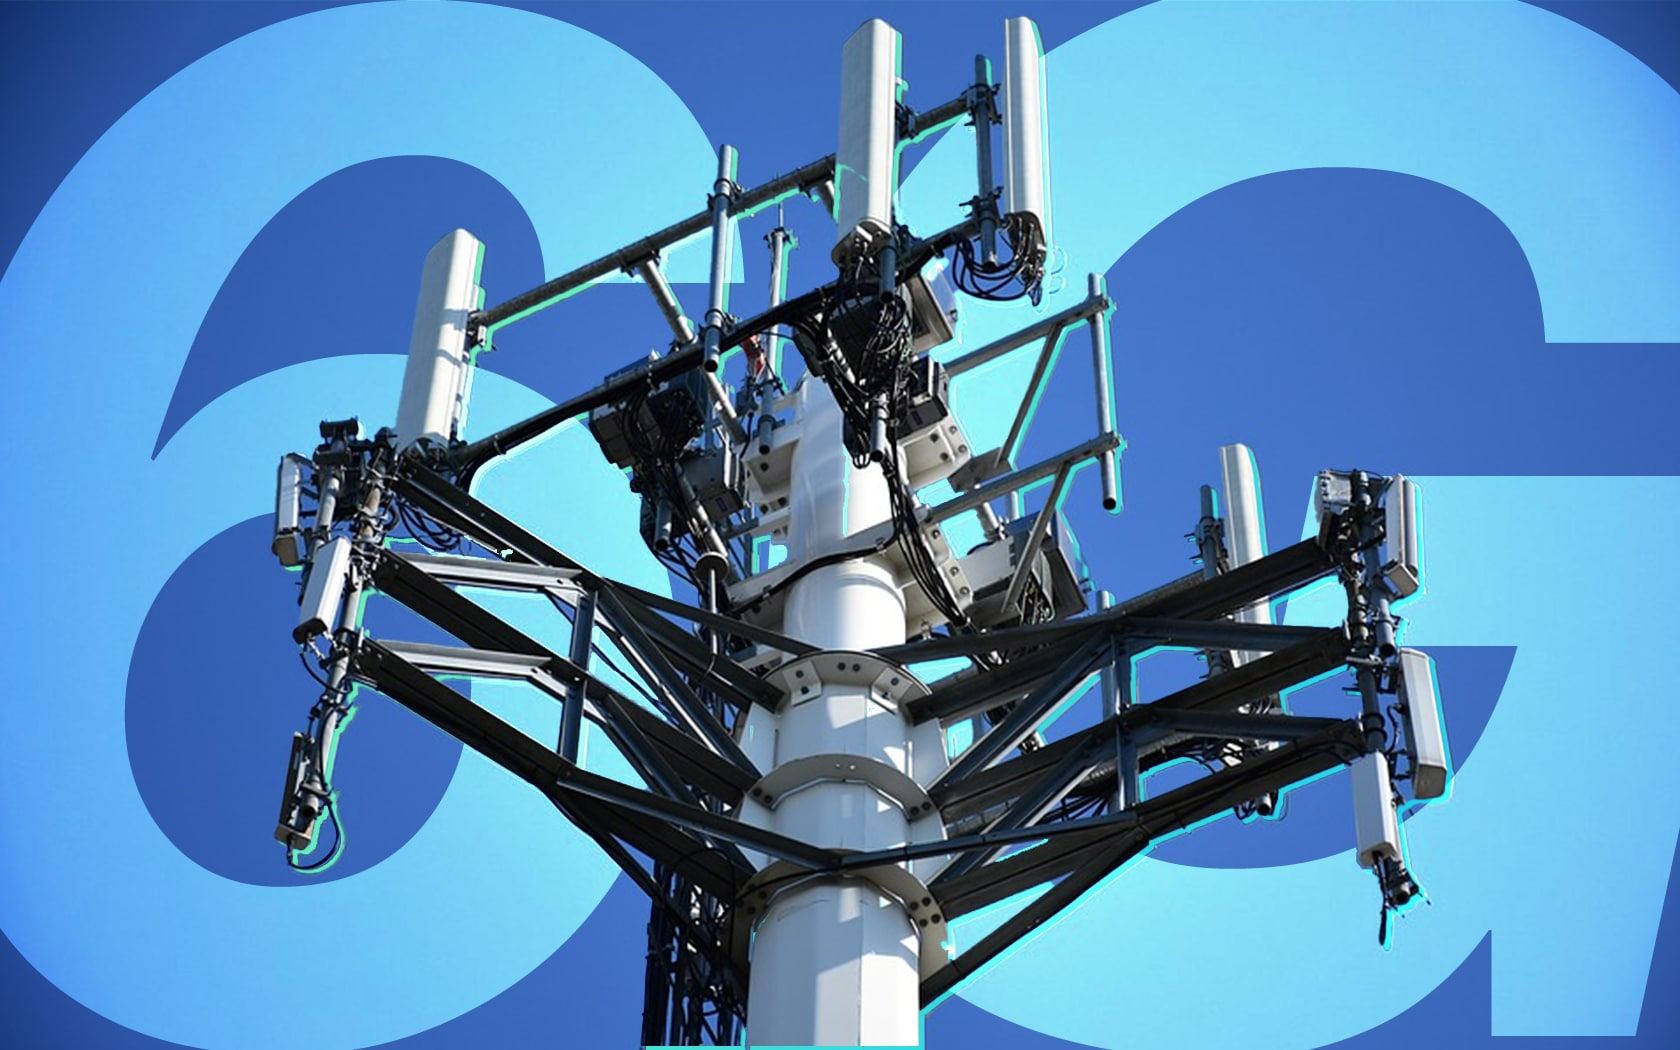 6G antennes